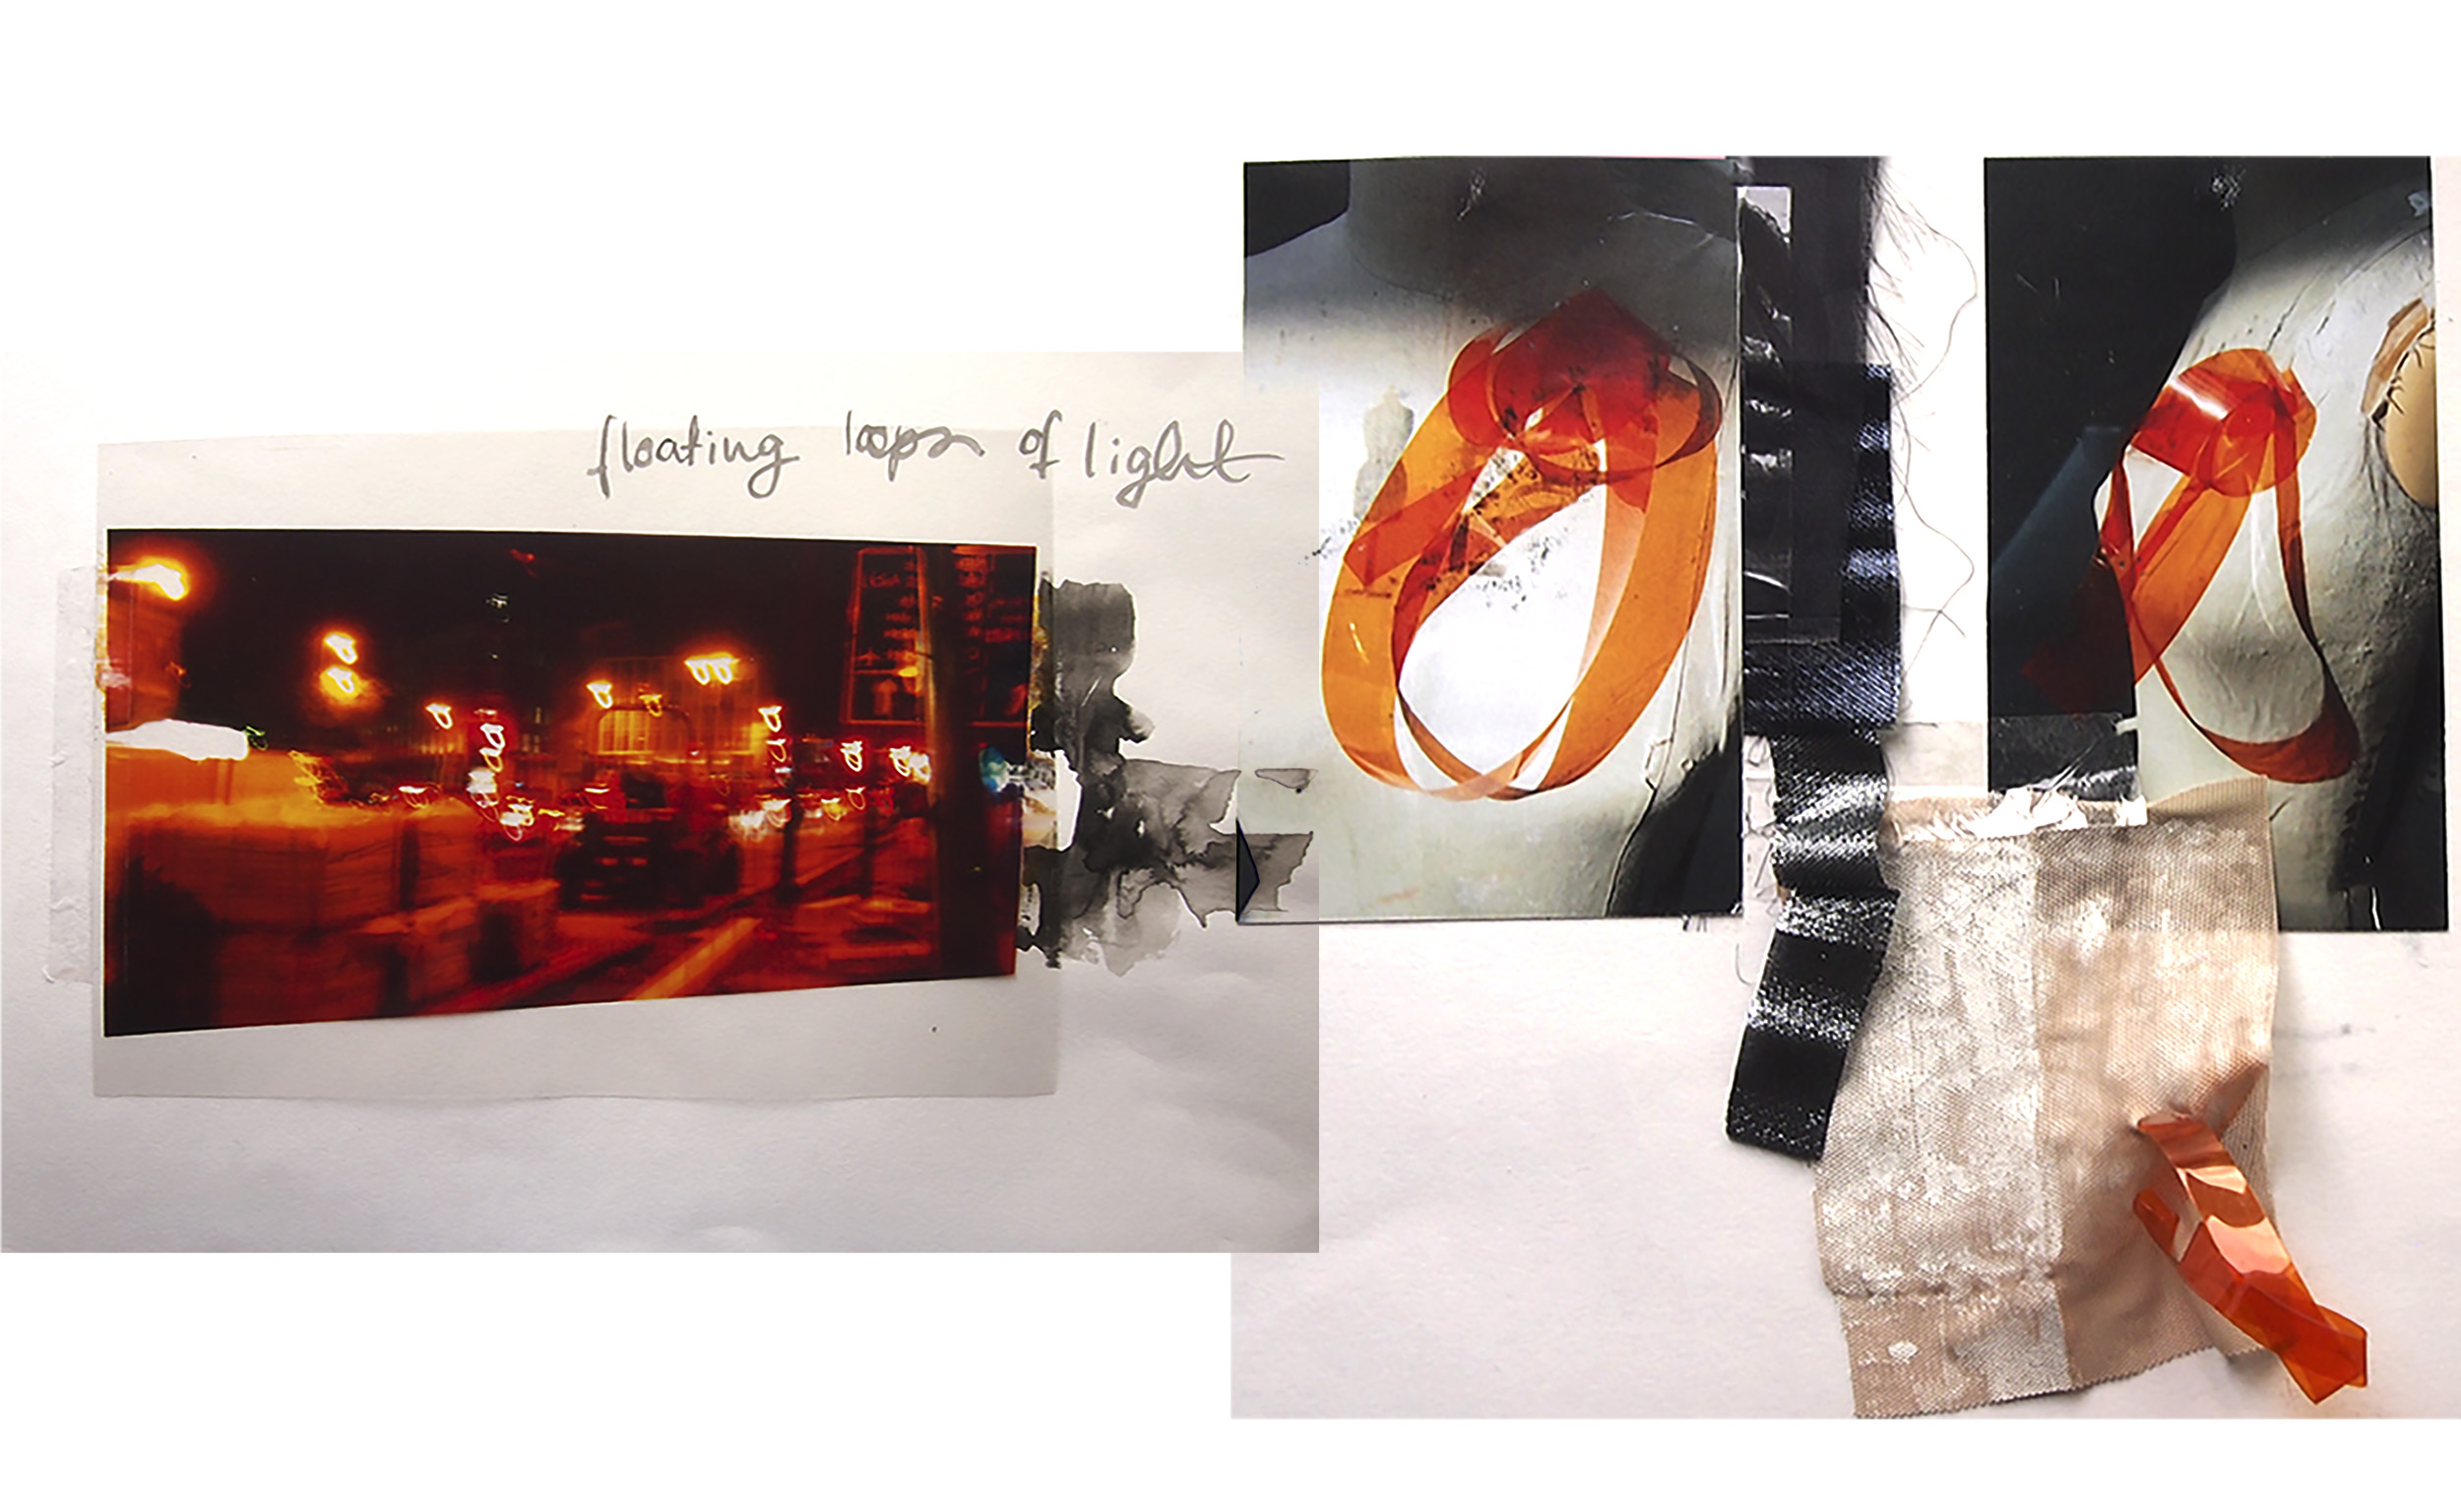 draping lights-development3.jpg